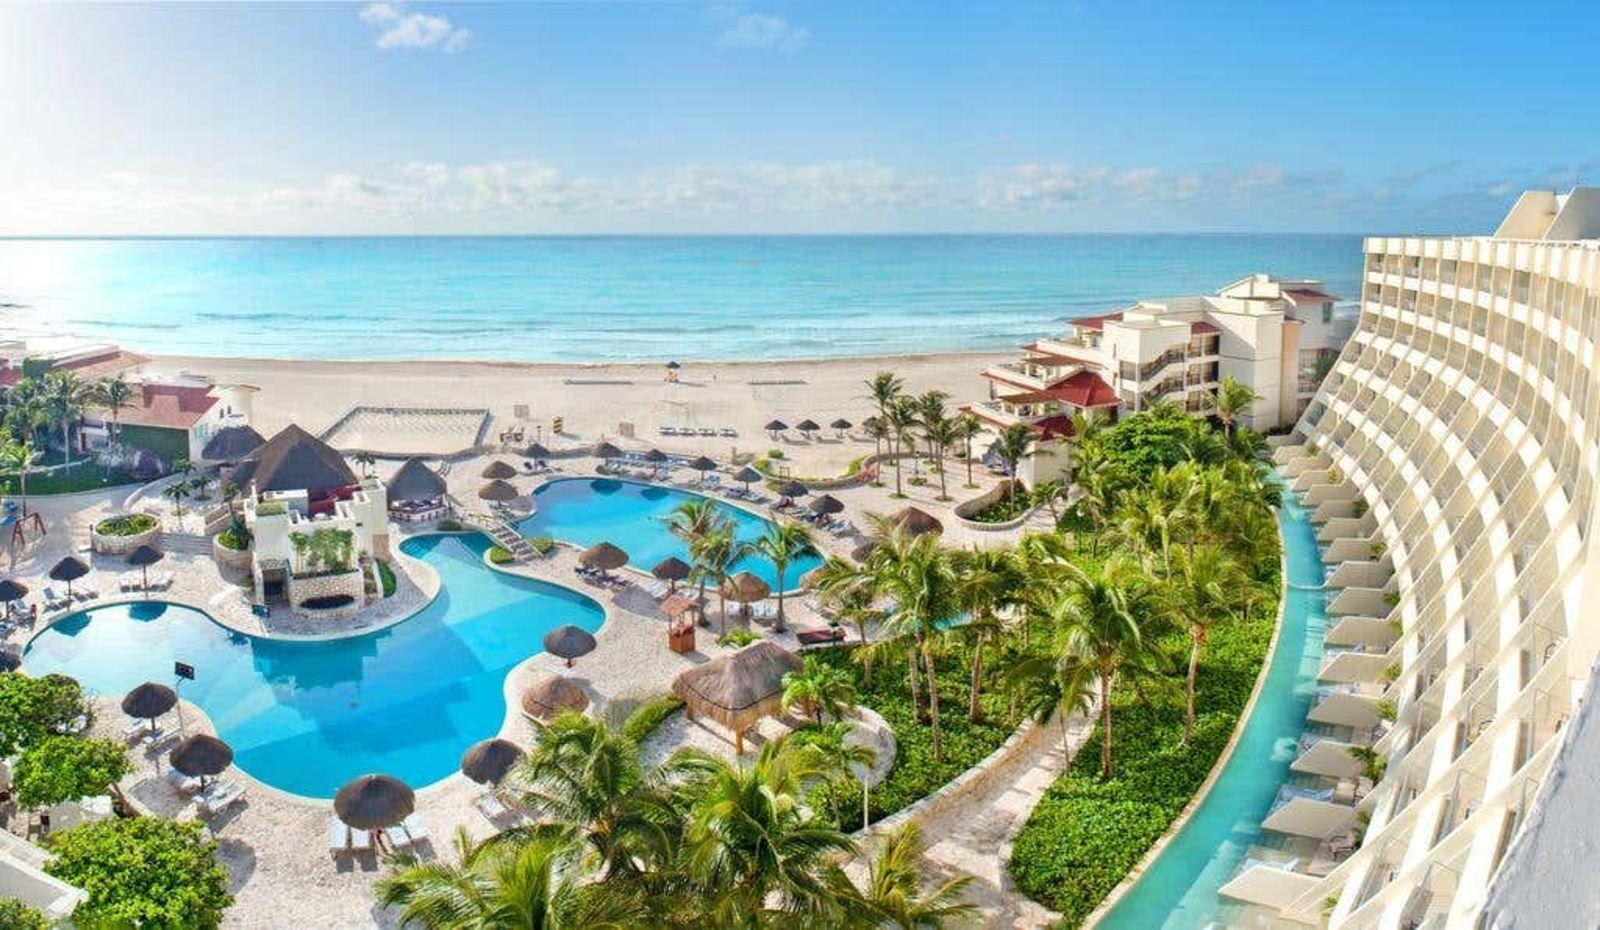 Grand Park Royal Cancun, Love Holidays